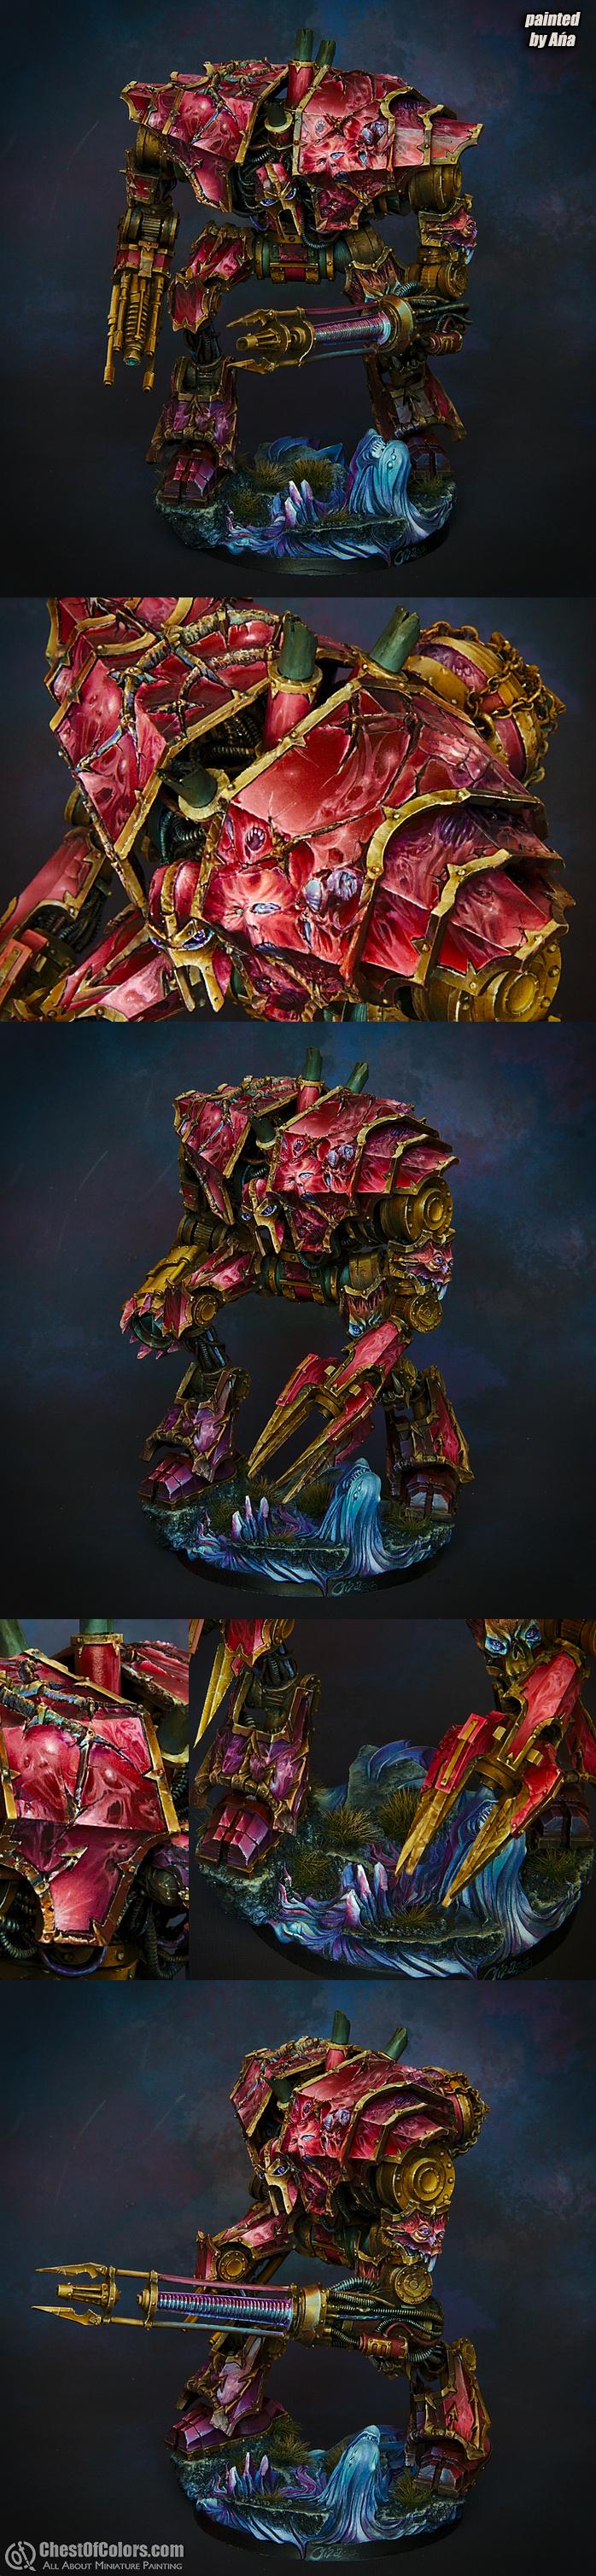 Chaos Decimator Engine [Forge World] - more close-ups